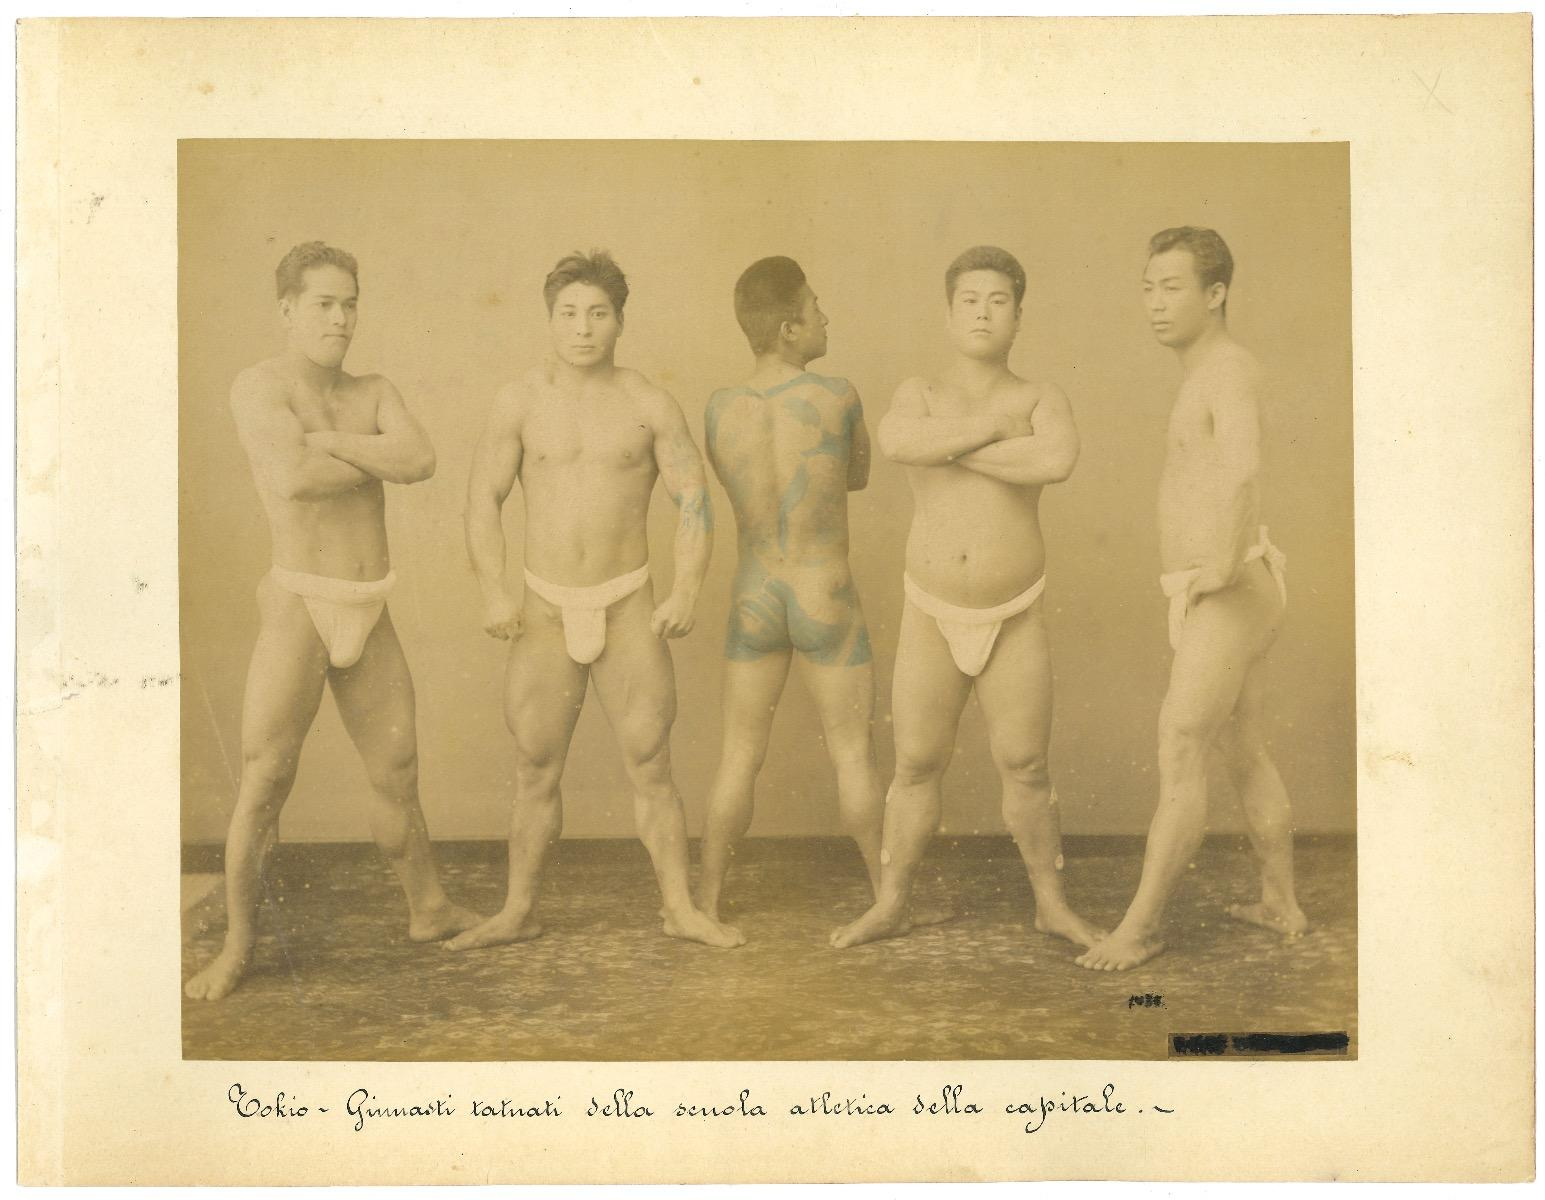 Ancient Portrait of Japanese Gymnasts - Original Albumen Print - 1880s/90s